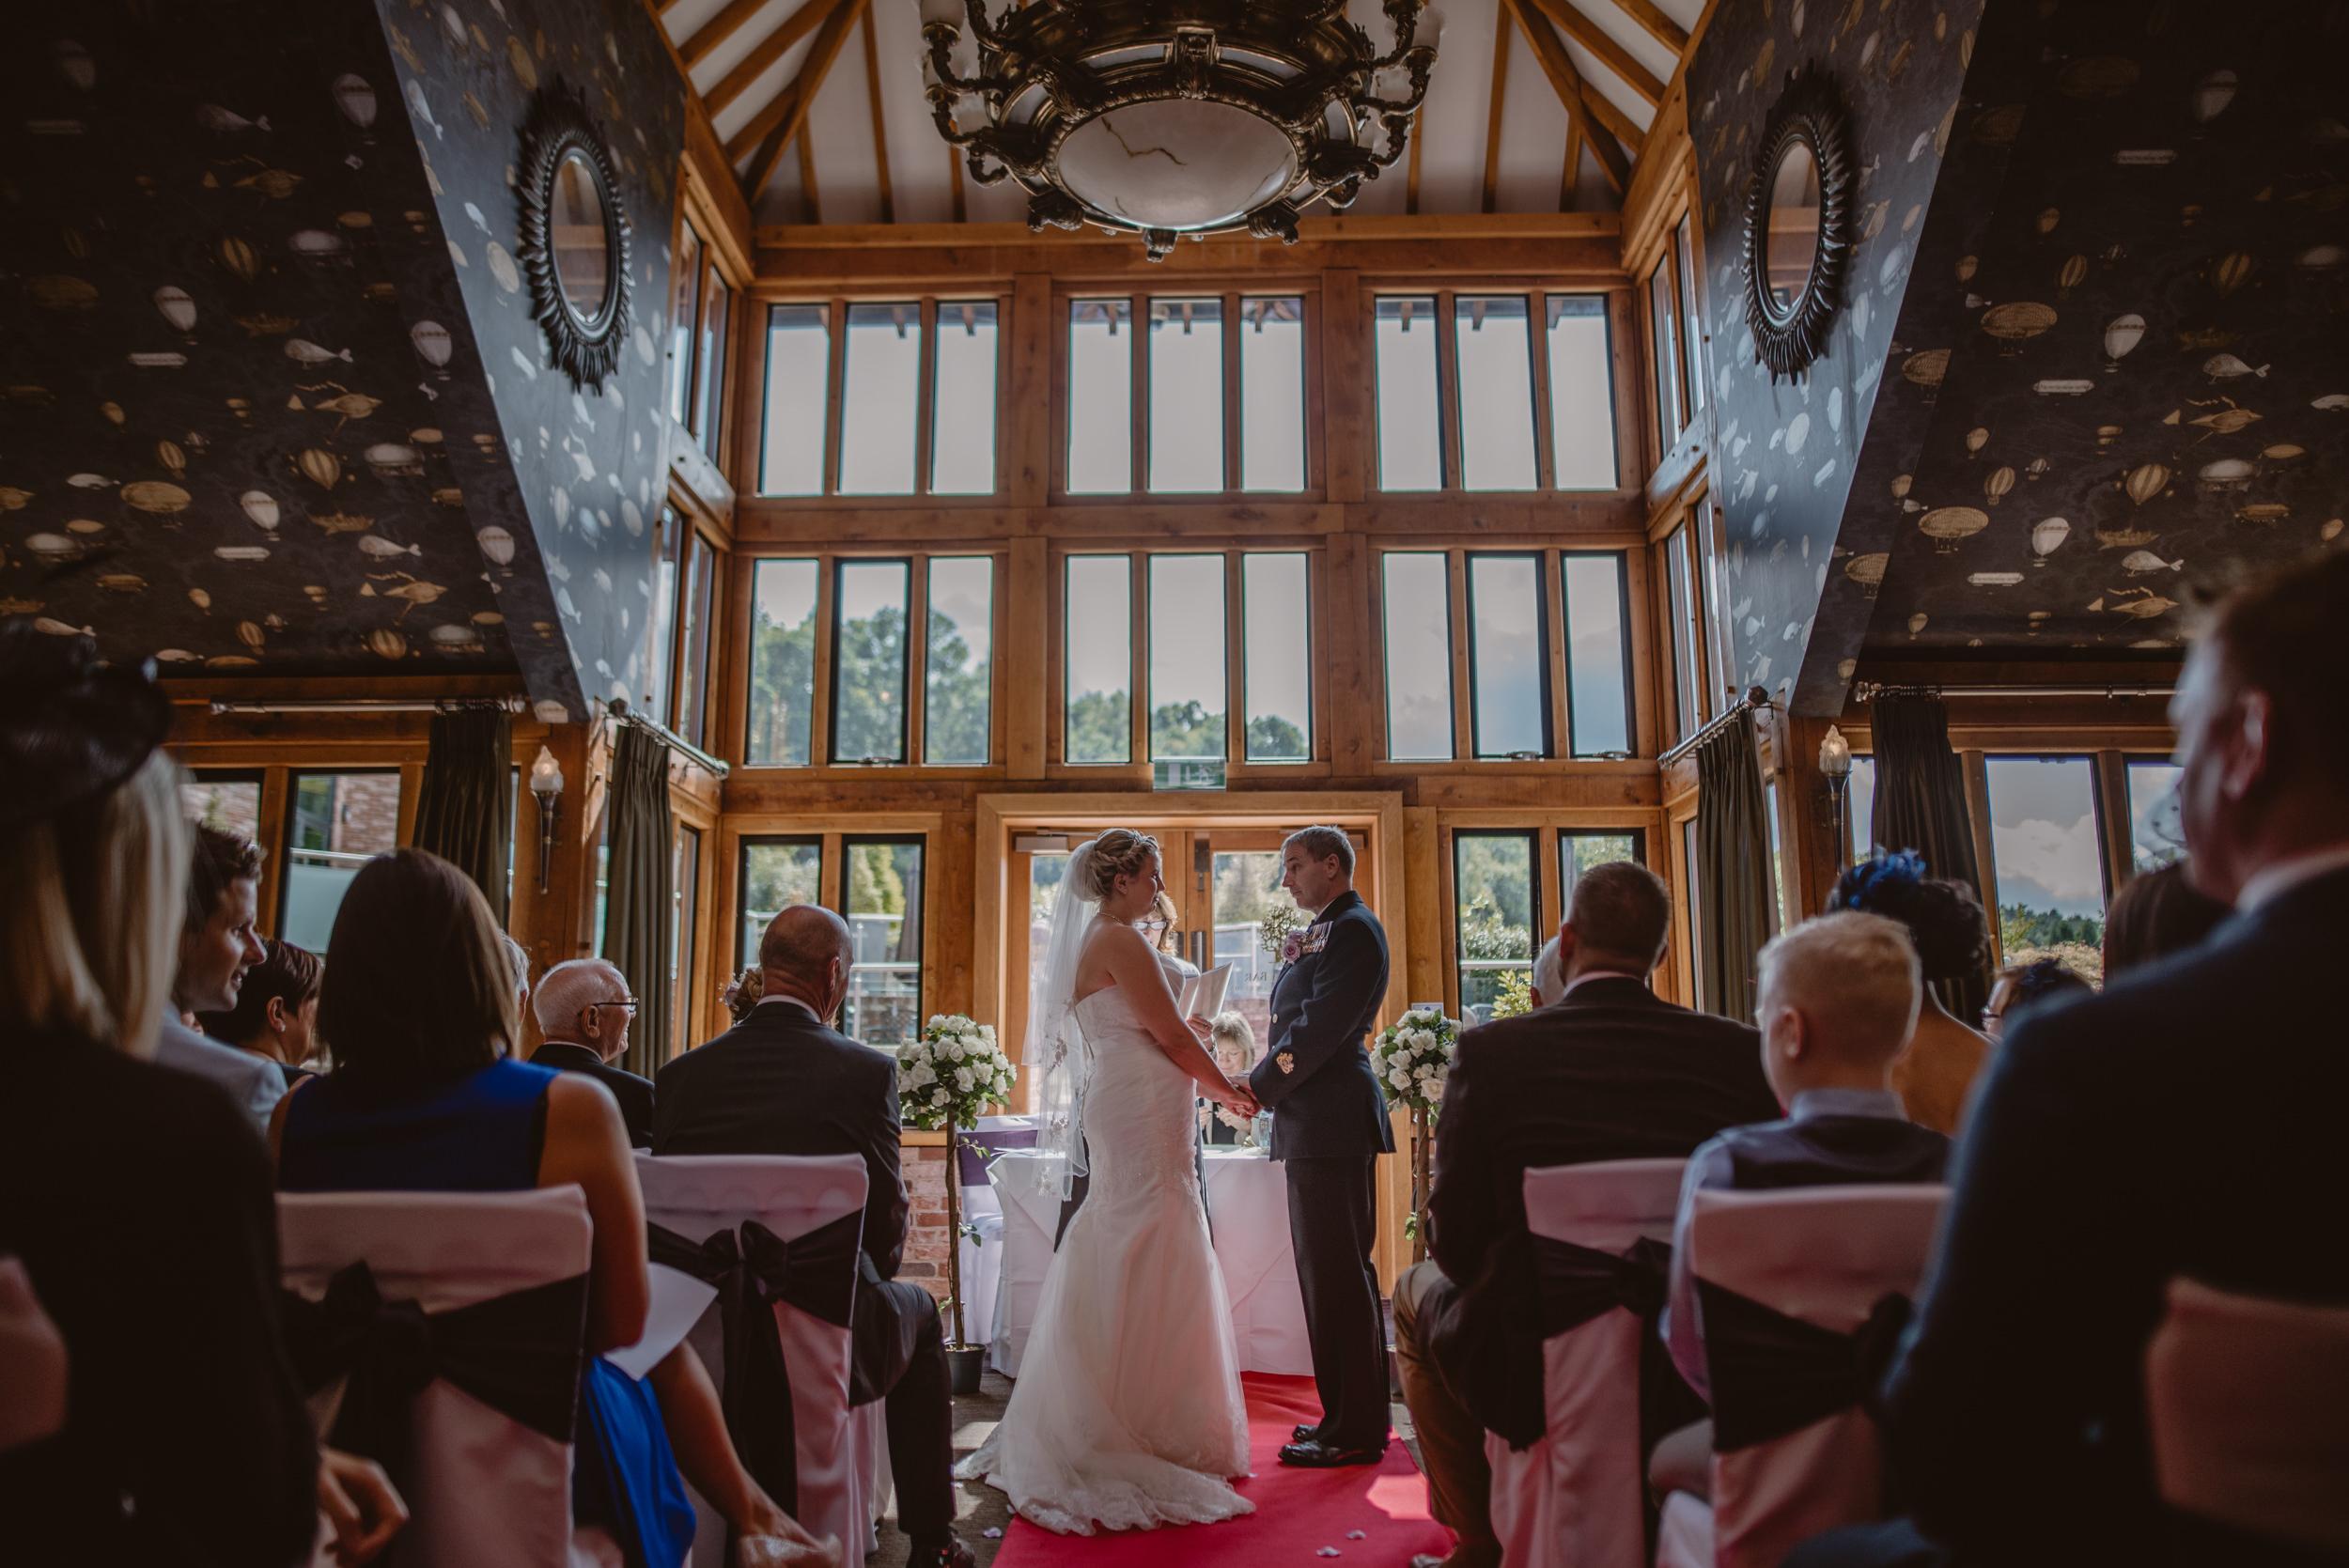 Chantelle-and-Stephen-Old-Thorns-Hotel-Wedding-Liphook-Manu-Mendoza-Wedding-Photography-199.jpg